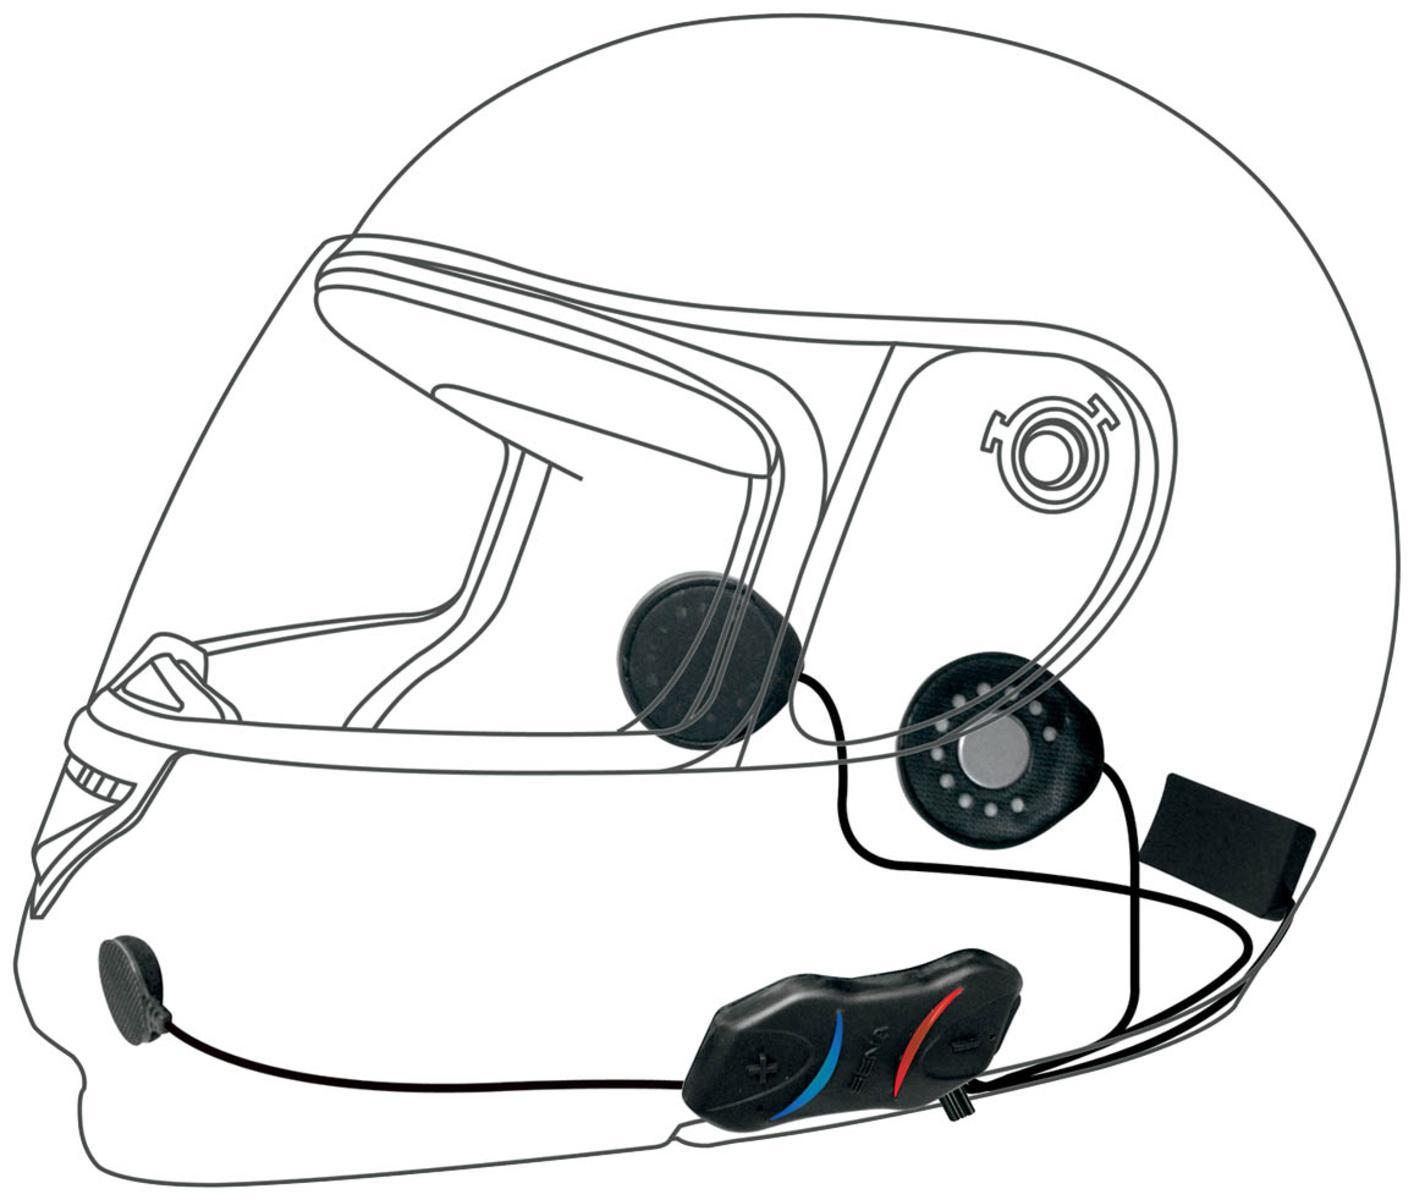 Sena Smh 10r Motorcycle Helmet Low Profile Bluetooth